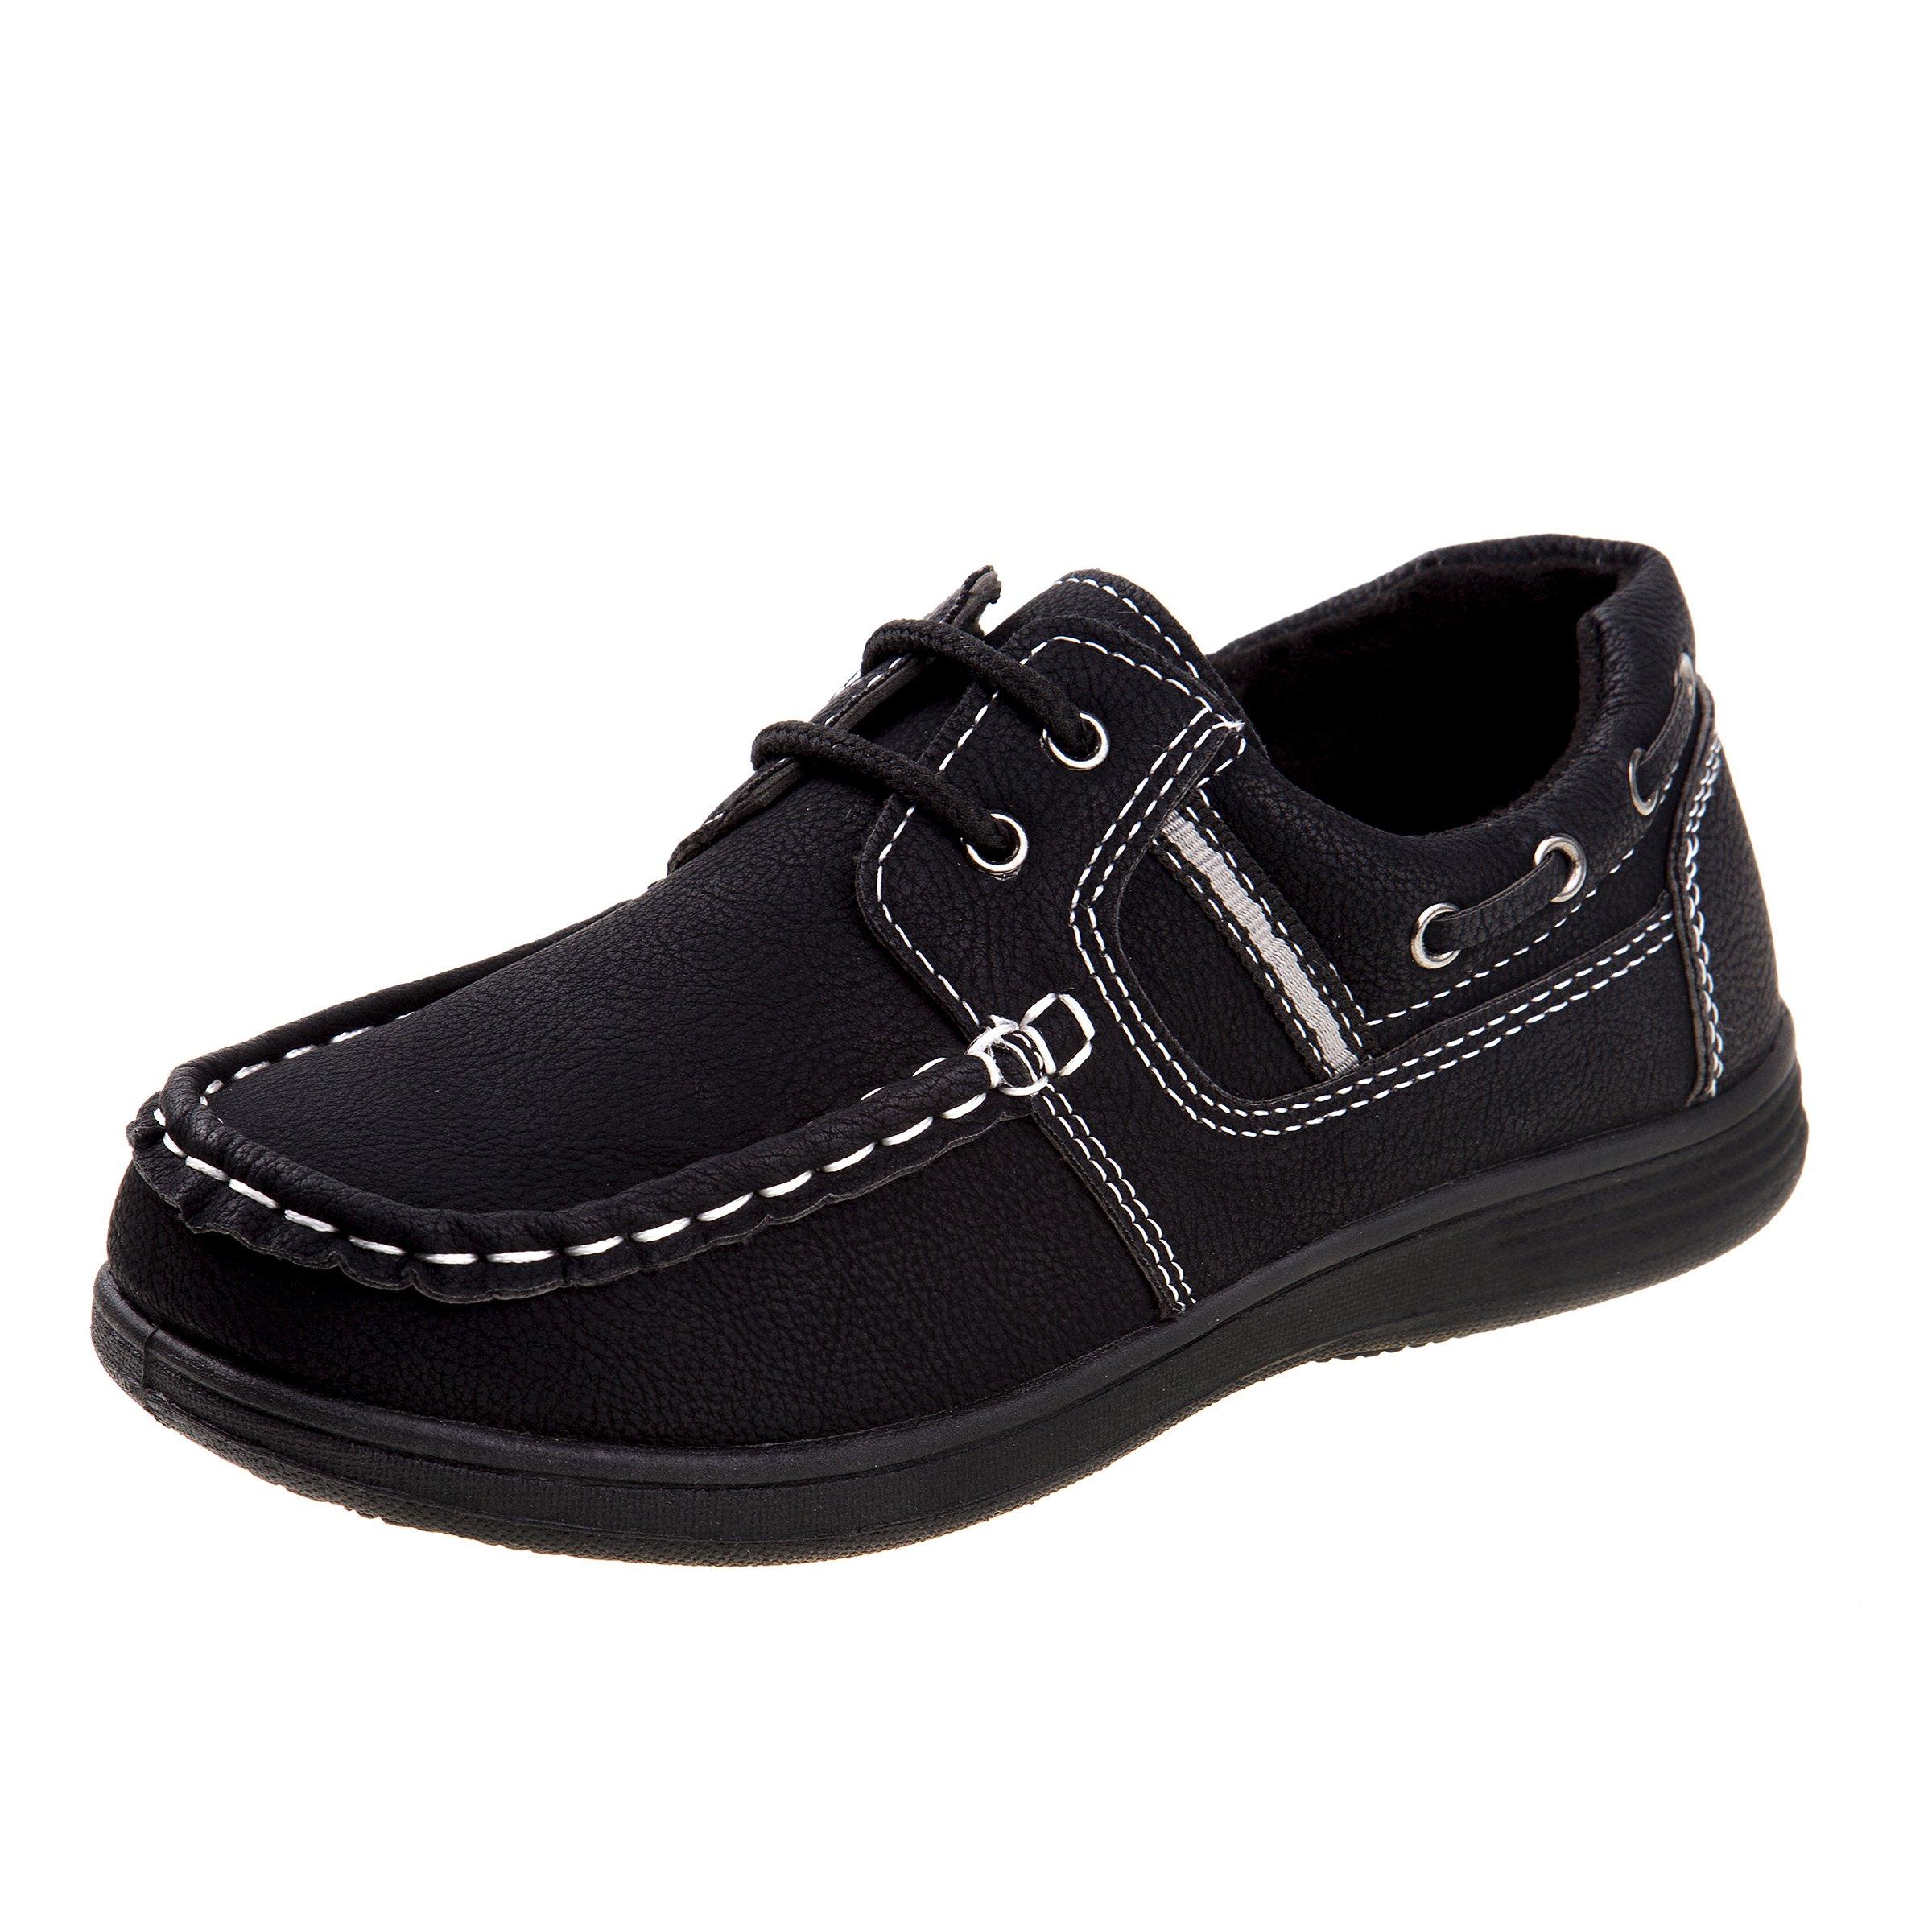 Josmo Boys Boat Shoes, Black, Size 12 M US Little Kid